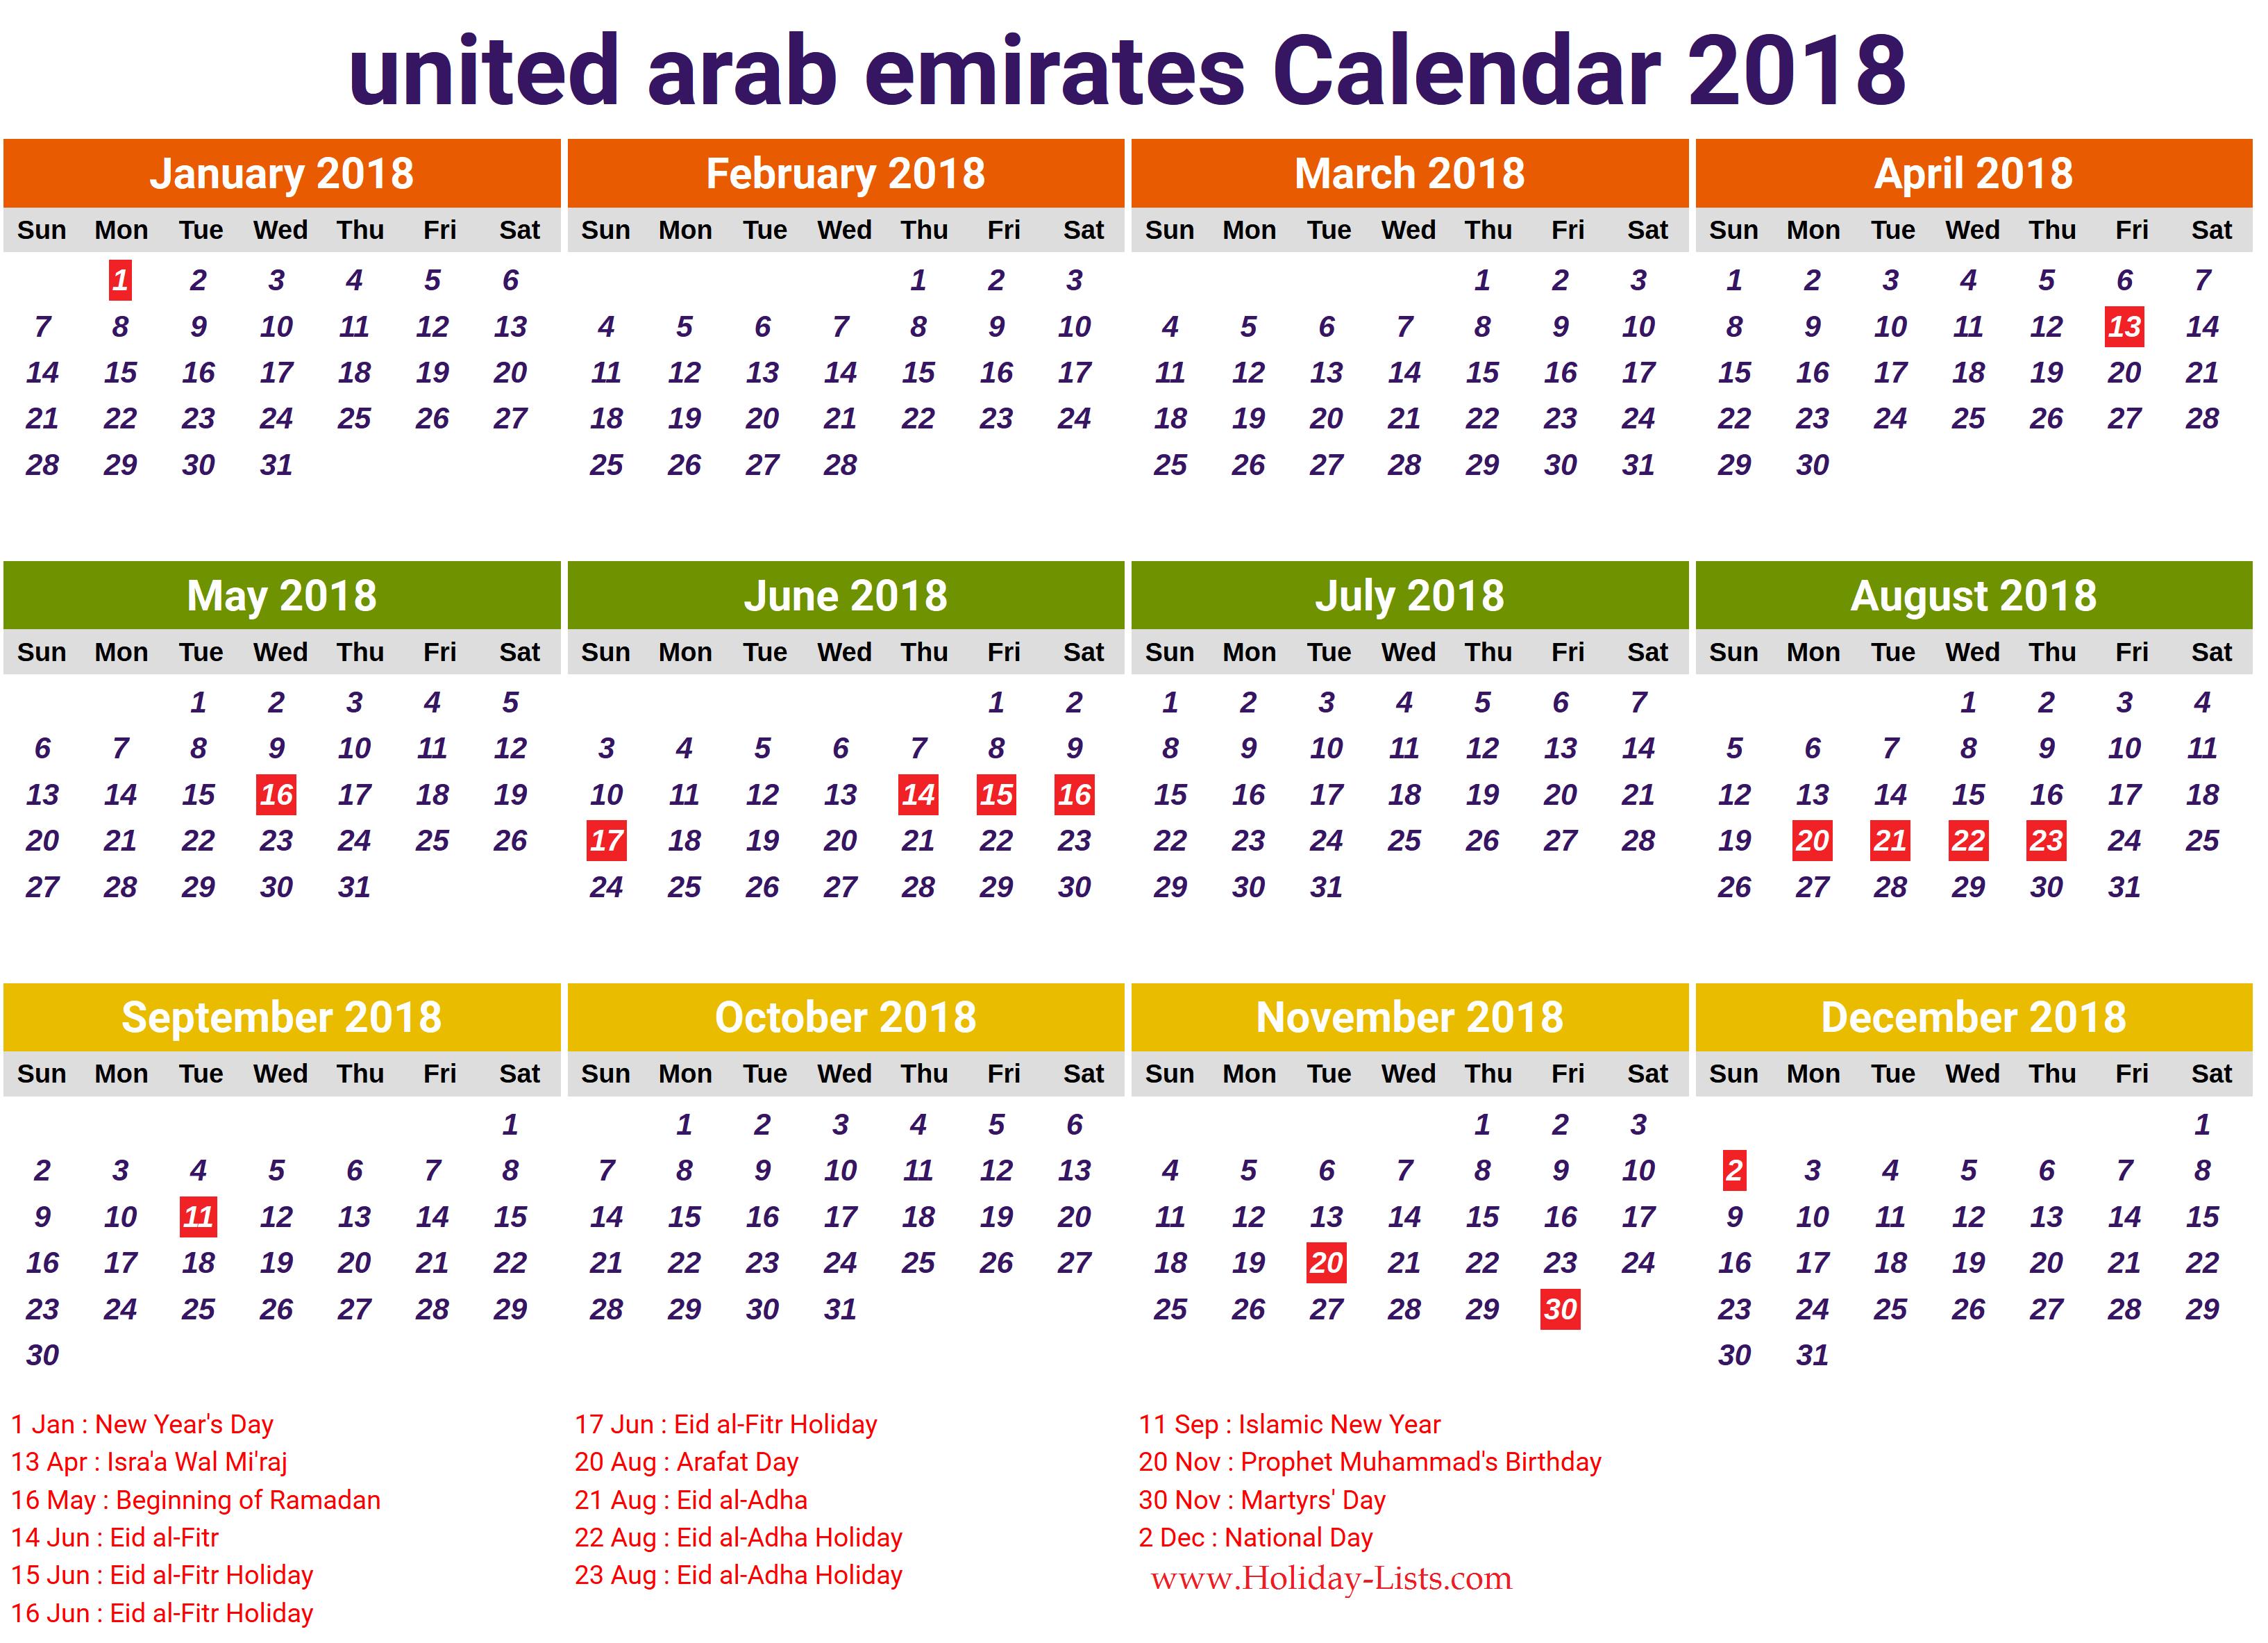 UAE calendar 2018